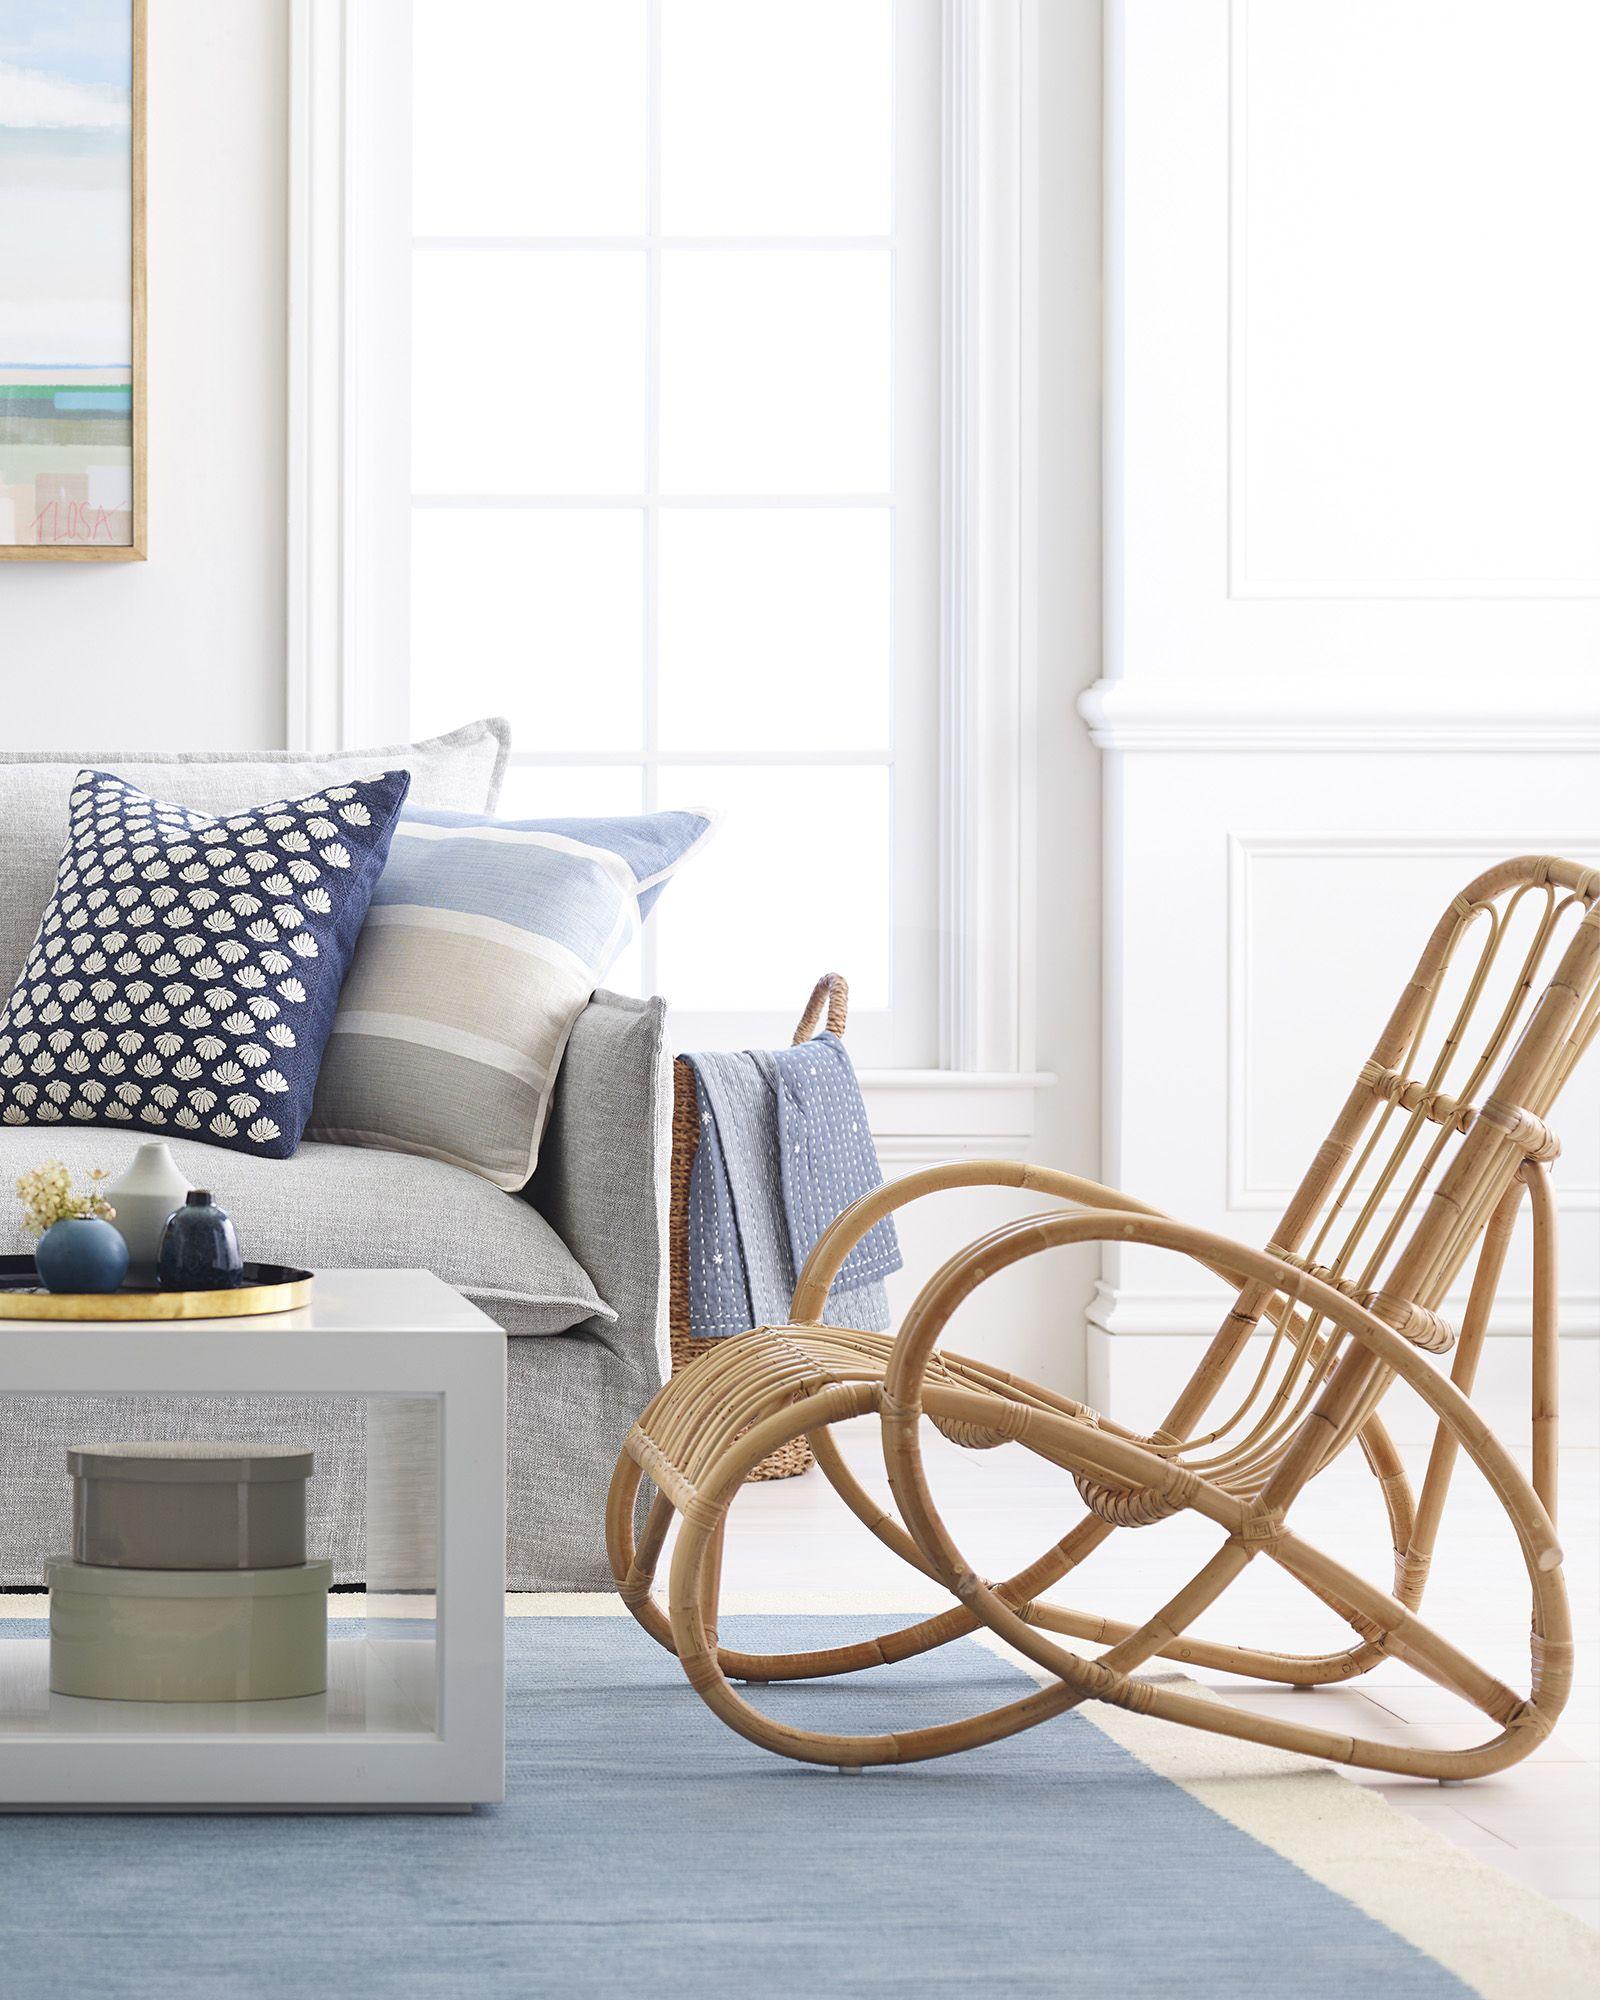 10+ Amazing Rattan Chair Living Room